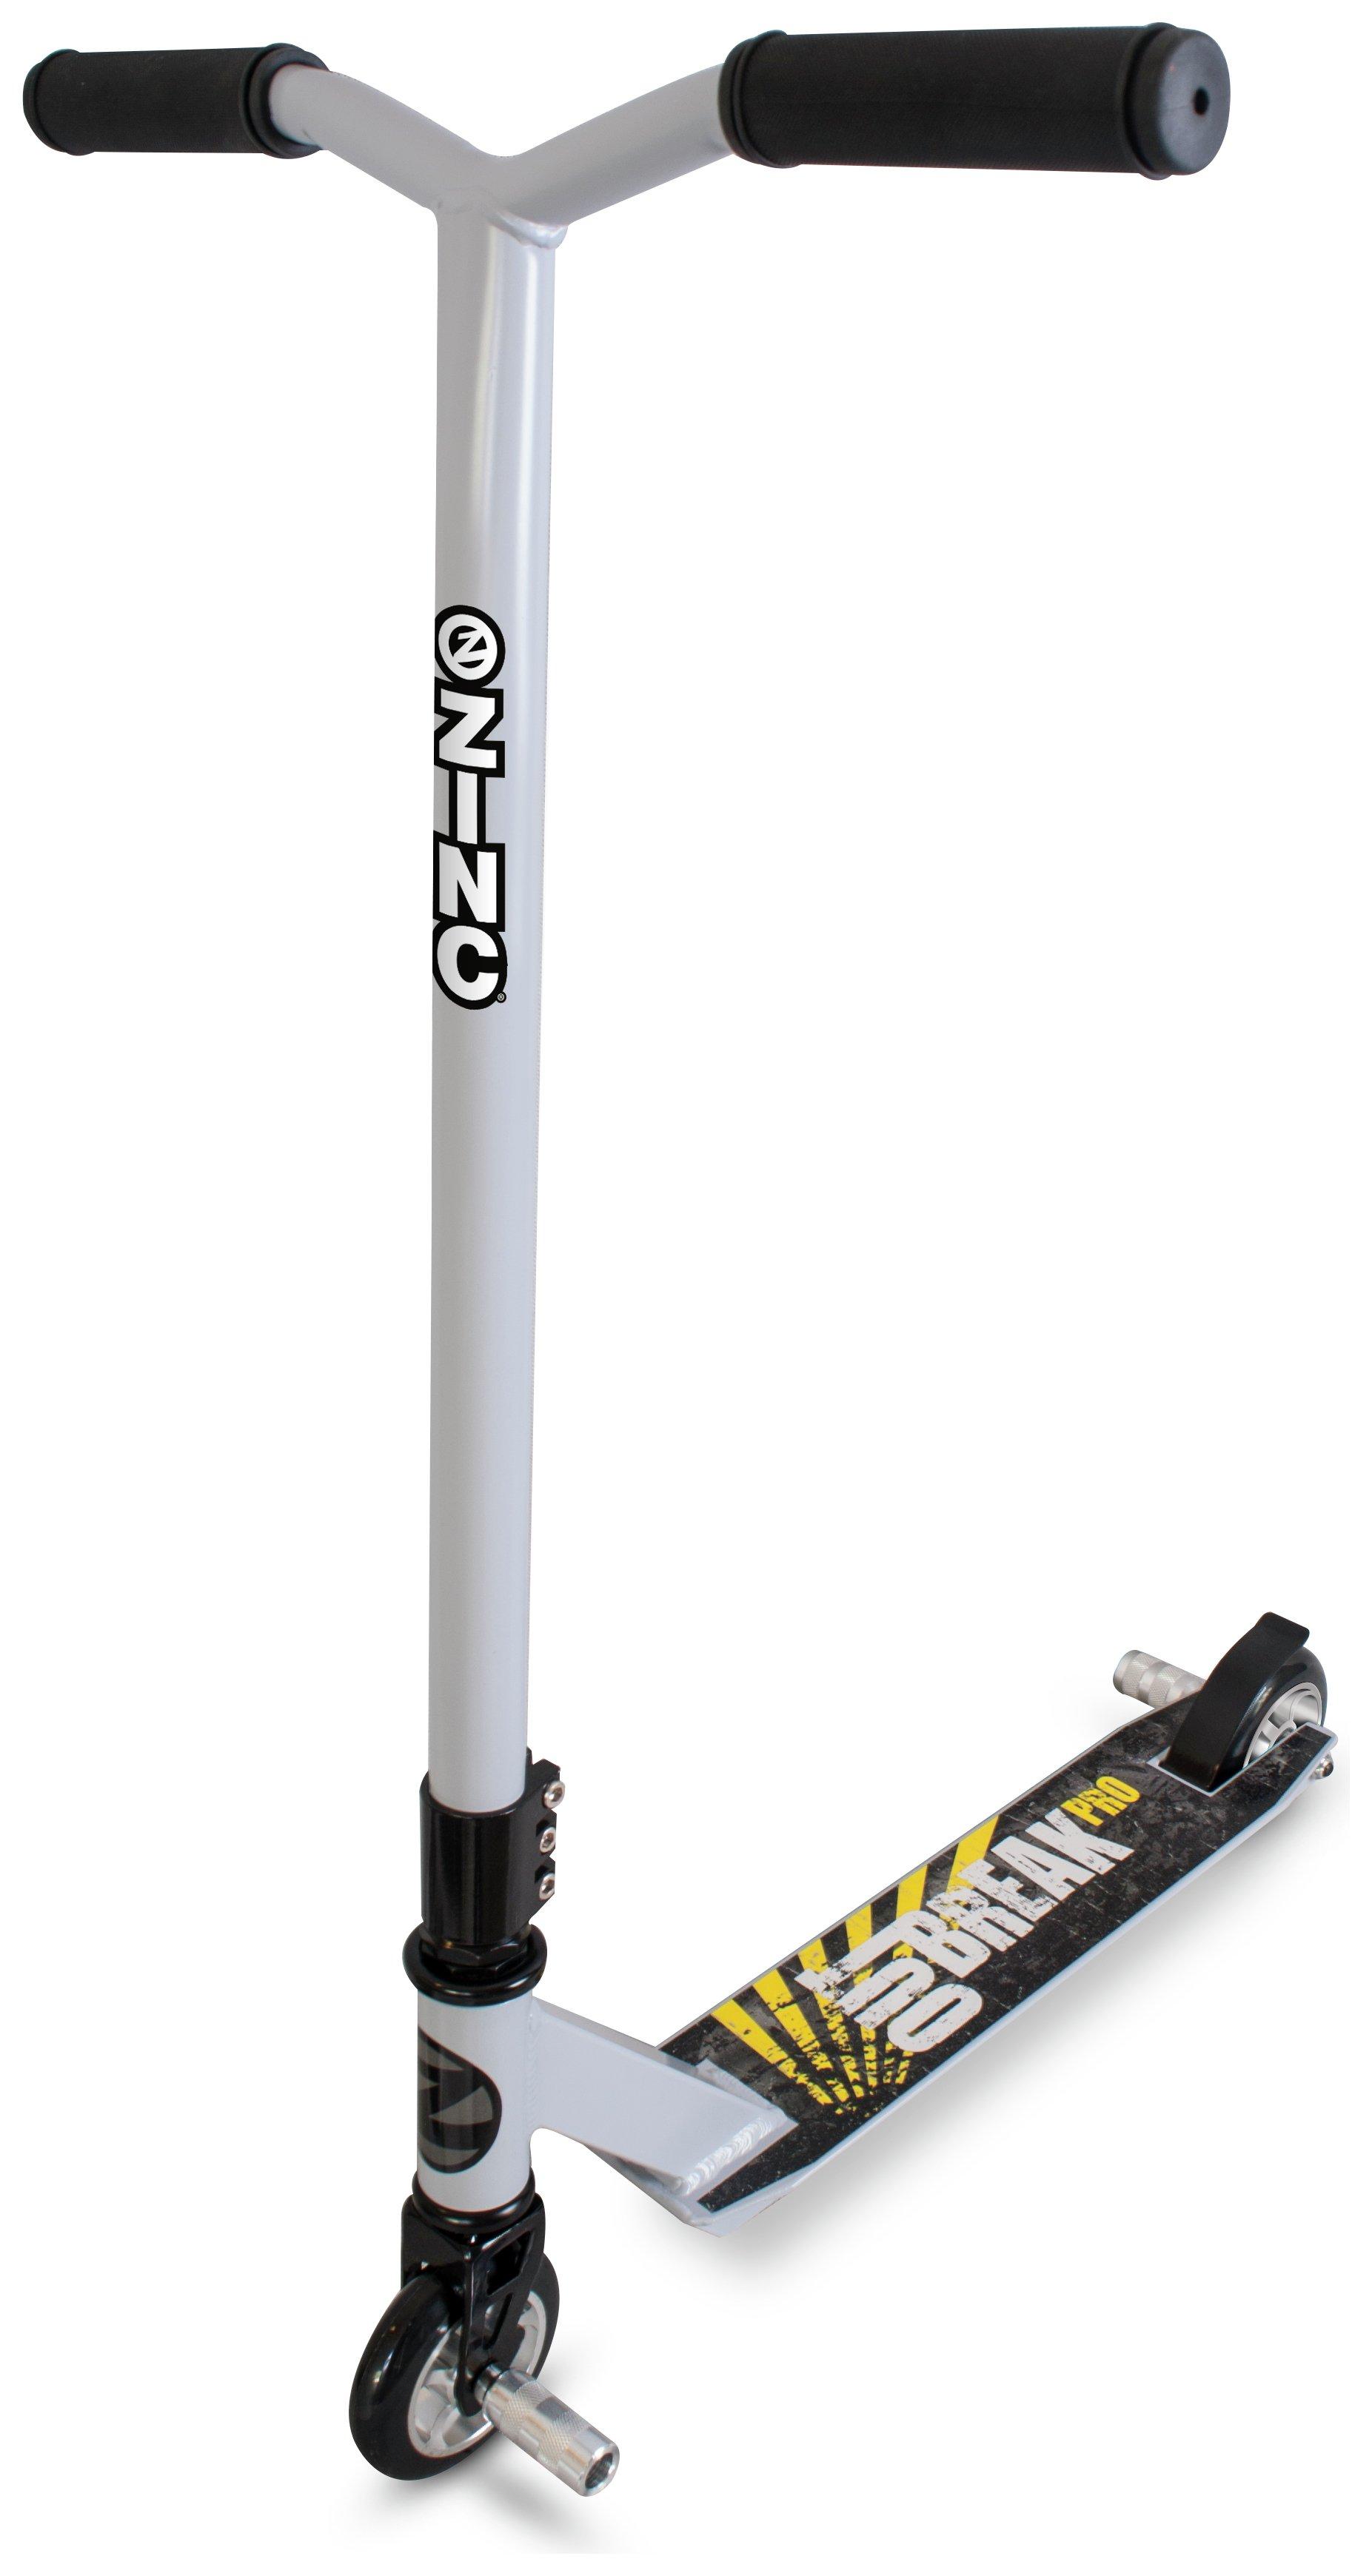 Zinc Outbreak Pro Stunt Scooter